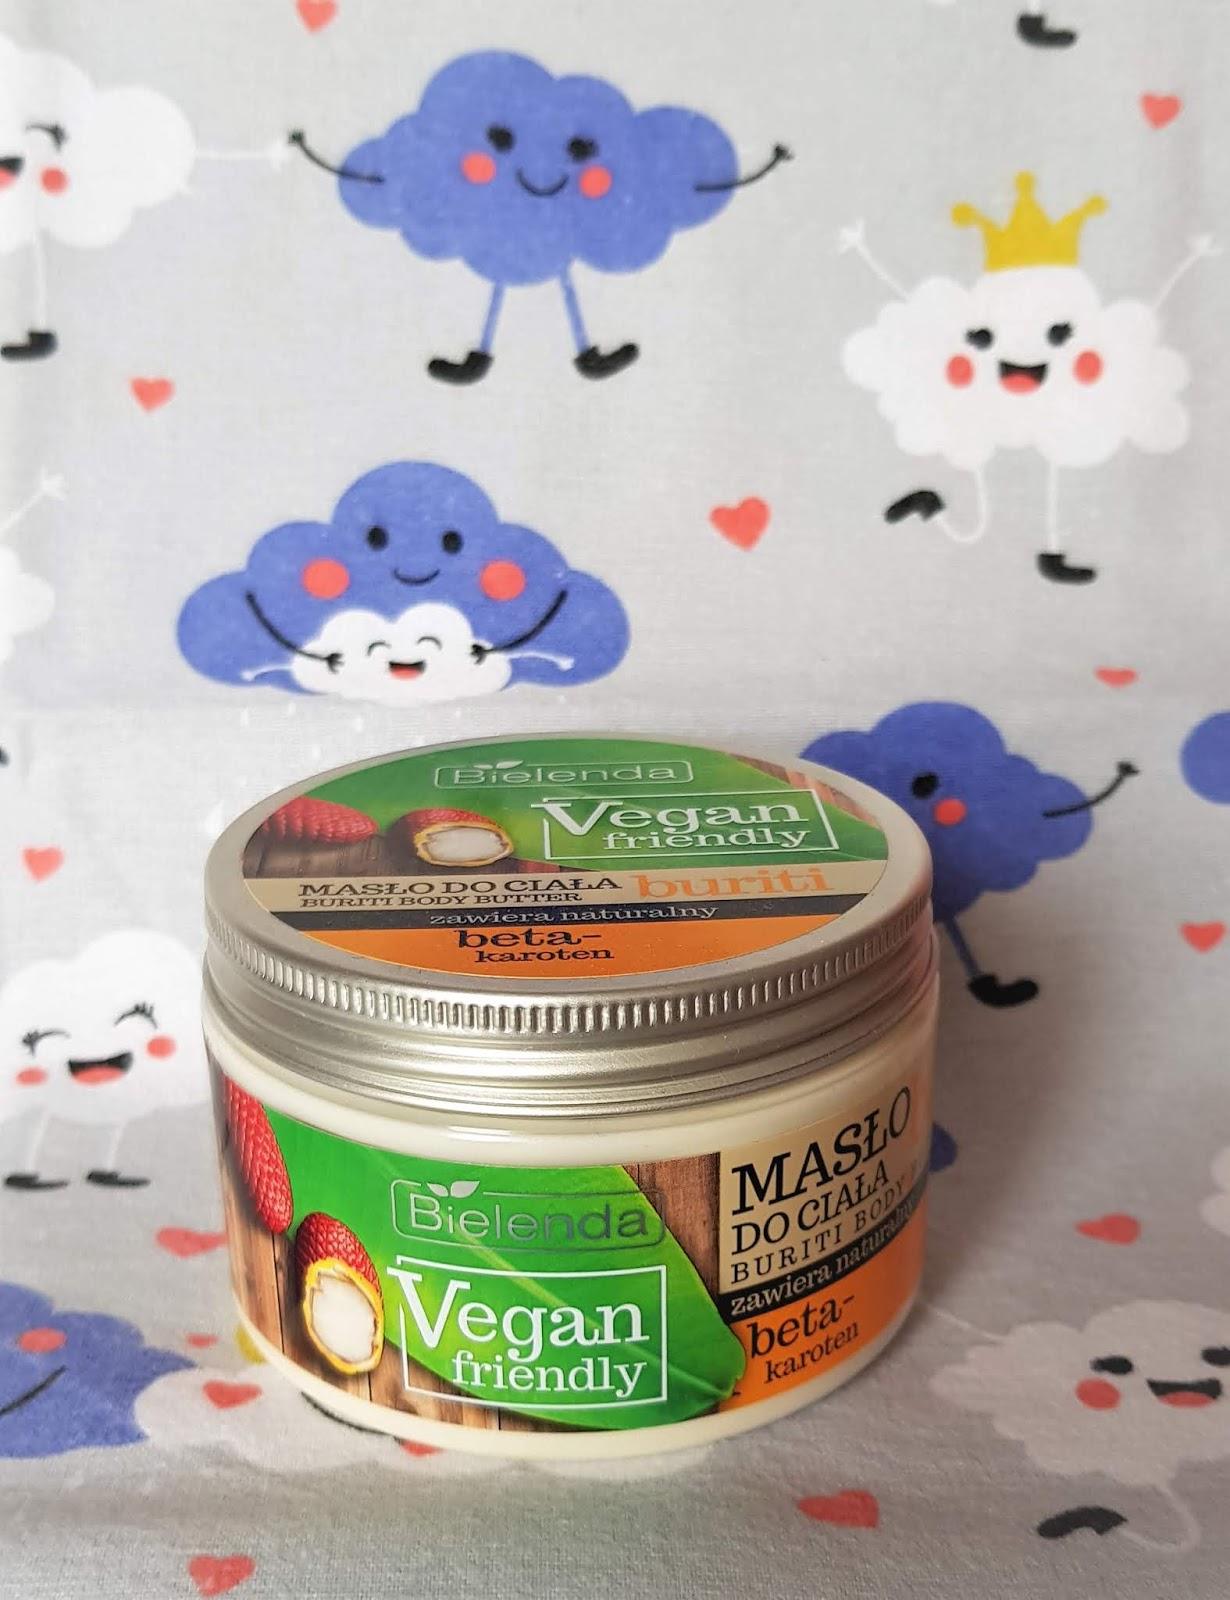 Bielenda vegan friendly masło do ciała buriti